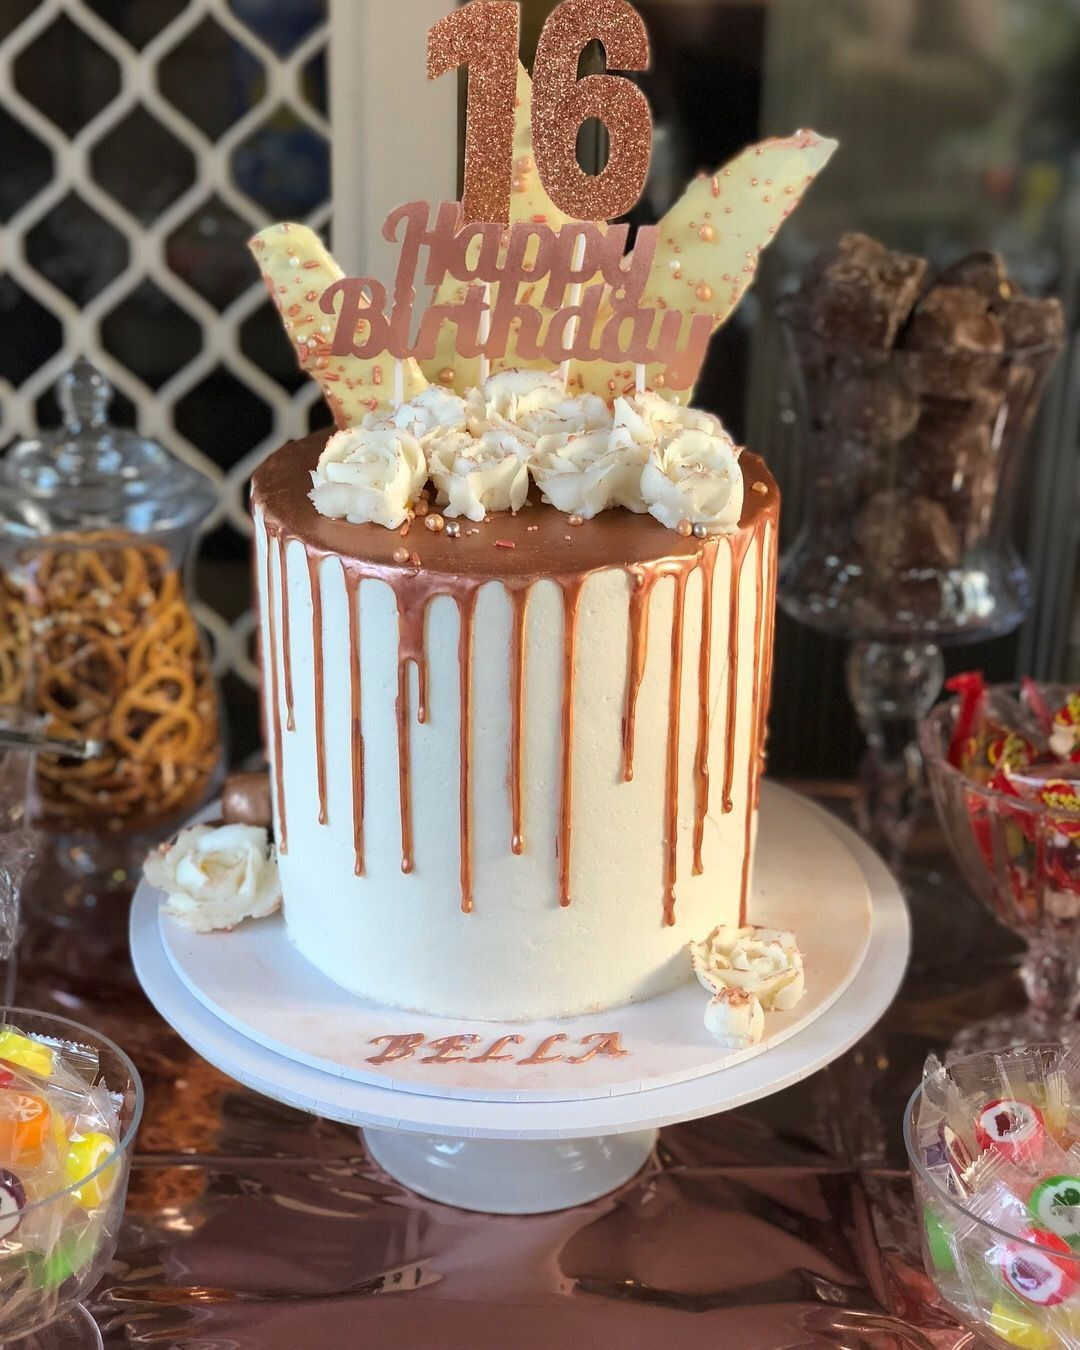 16th birthday party cake 15th birthday cakes 14th